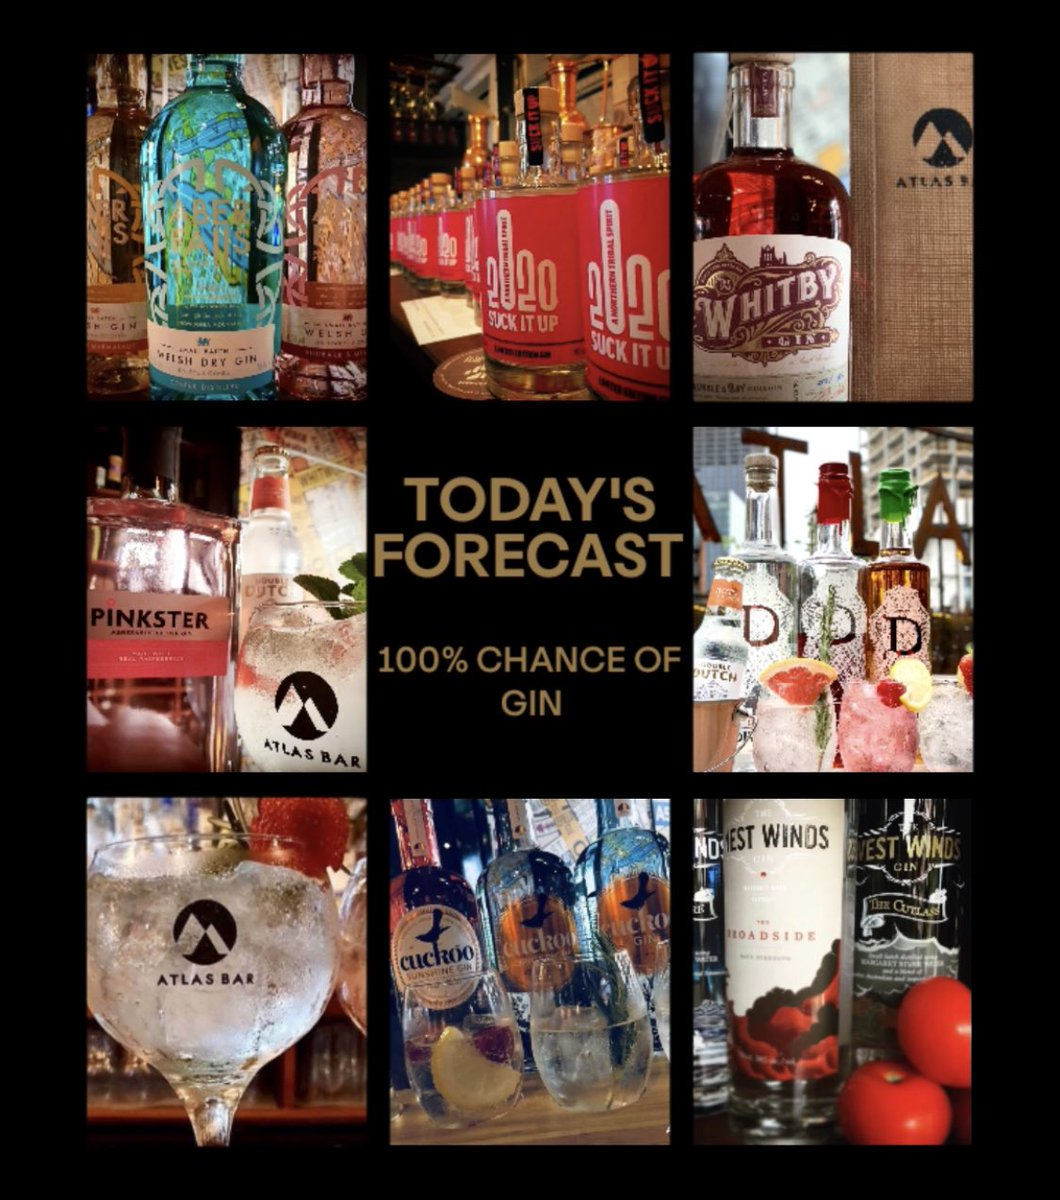 #StormChristoph has arrived #Manchester 🌧  Our daily forecast @TheAtlasBar is always #Gin 🍸  @aberdistillery @DefianceSpirits @CuckooGin @GinWhitby @gindivine @PinksterGin @TheWestWindsGin @DoubleDutchMix 🎉